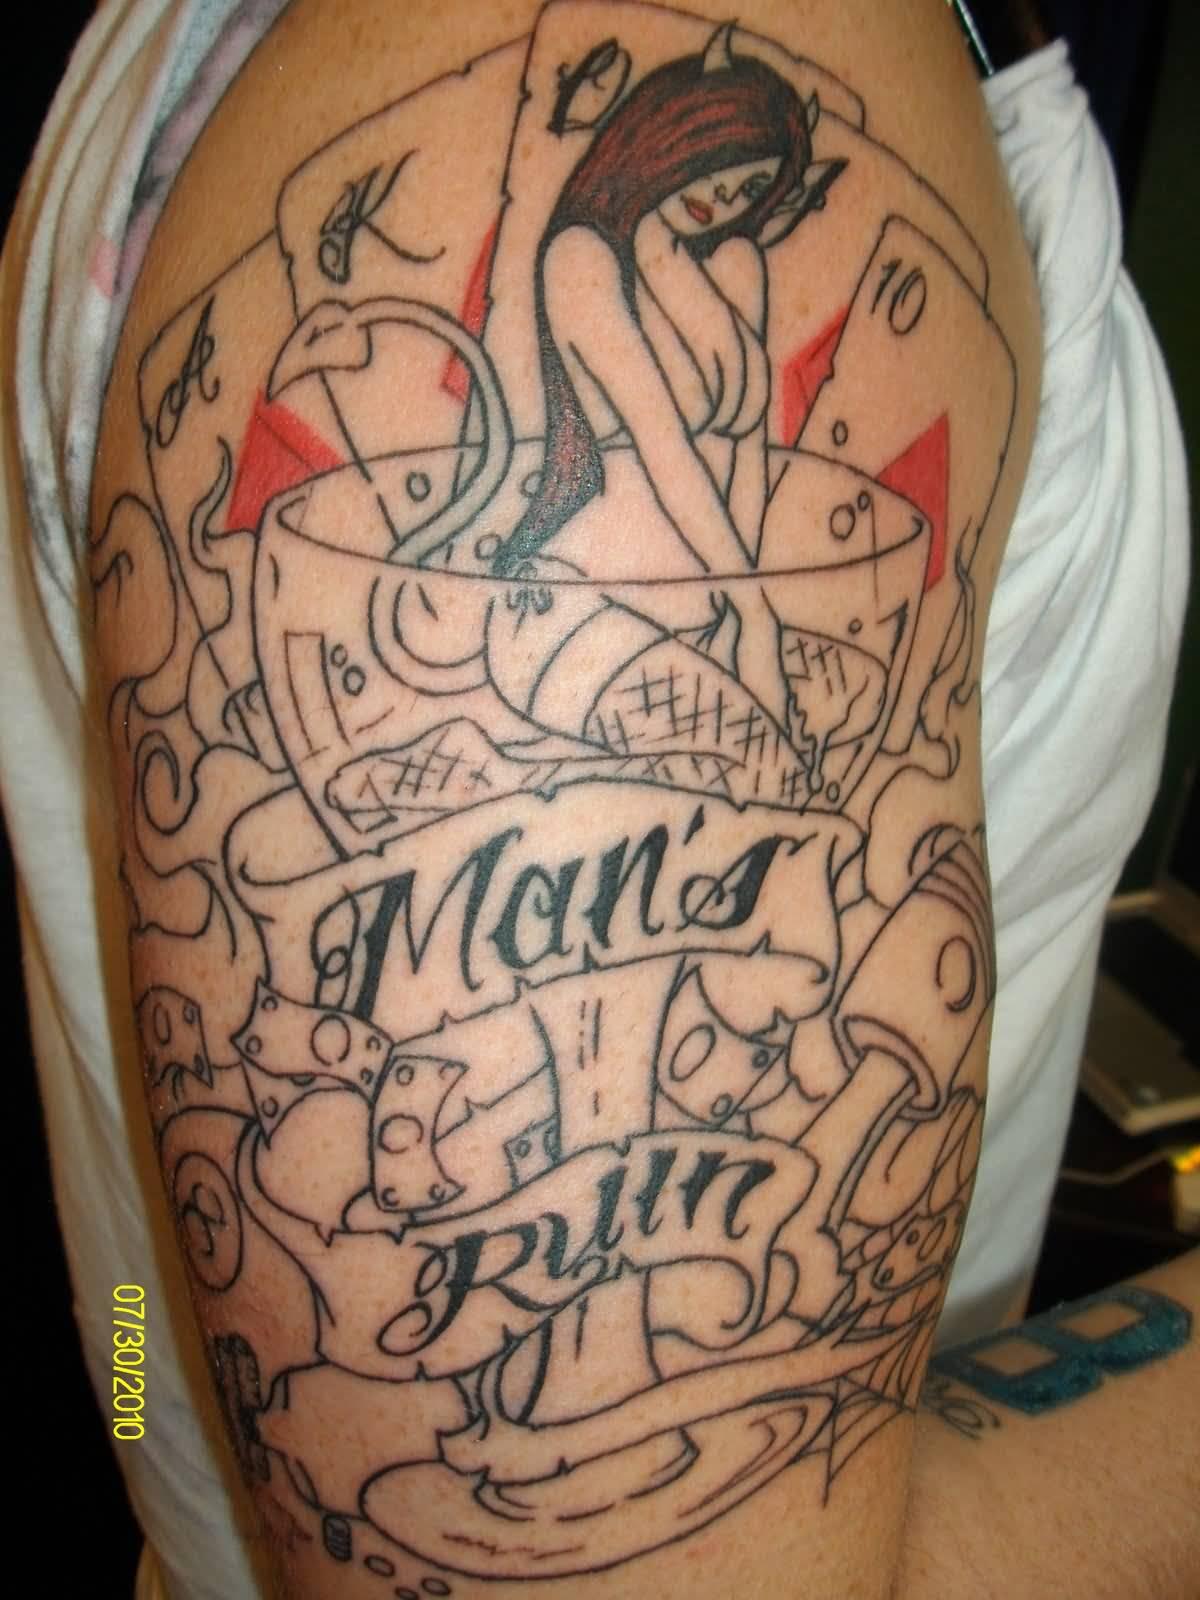 Gambling themed tattoo sleeves